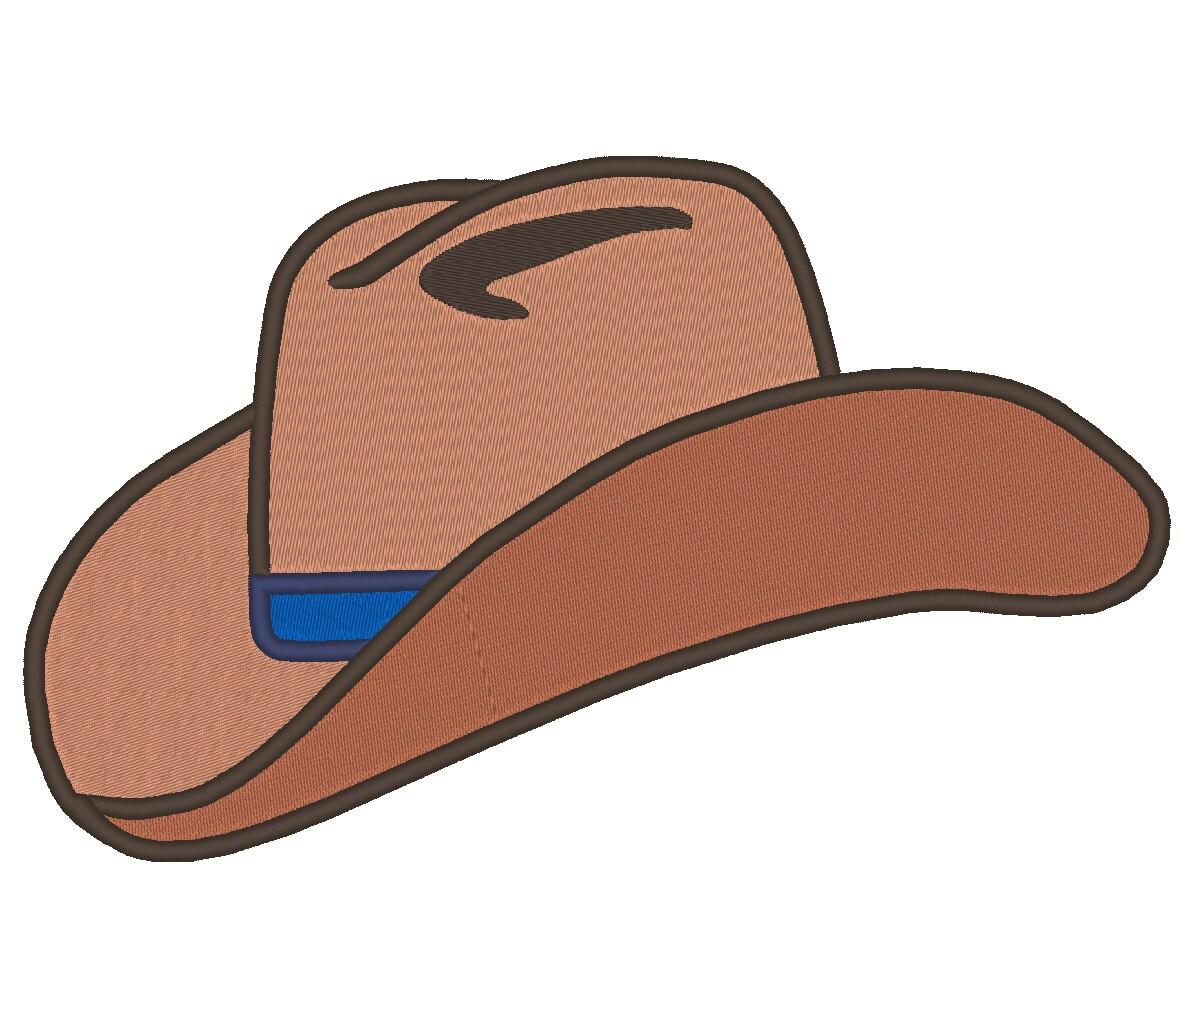 Cowboy Hat Embroidery Machine Design